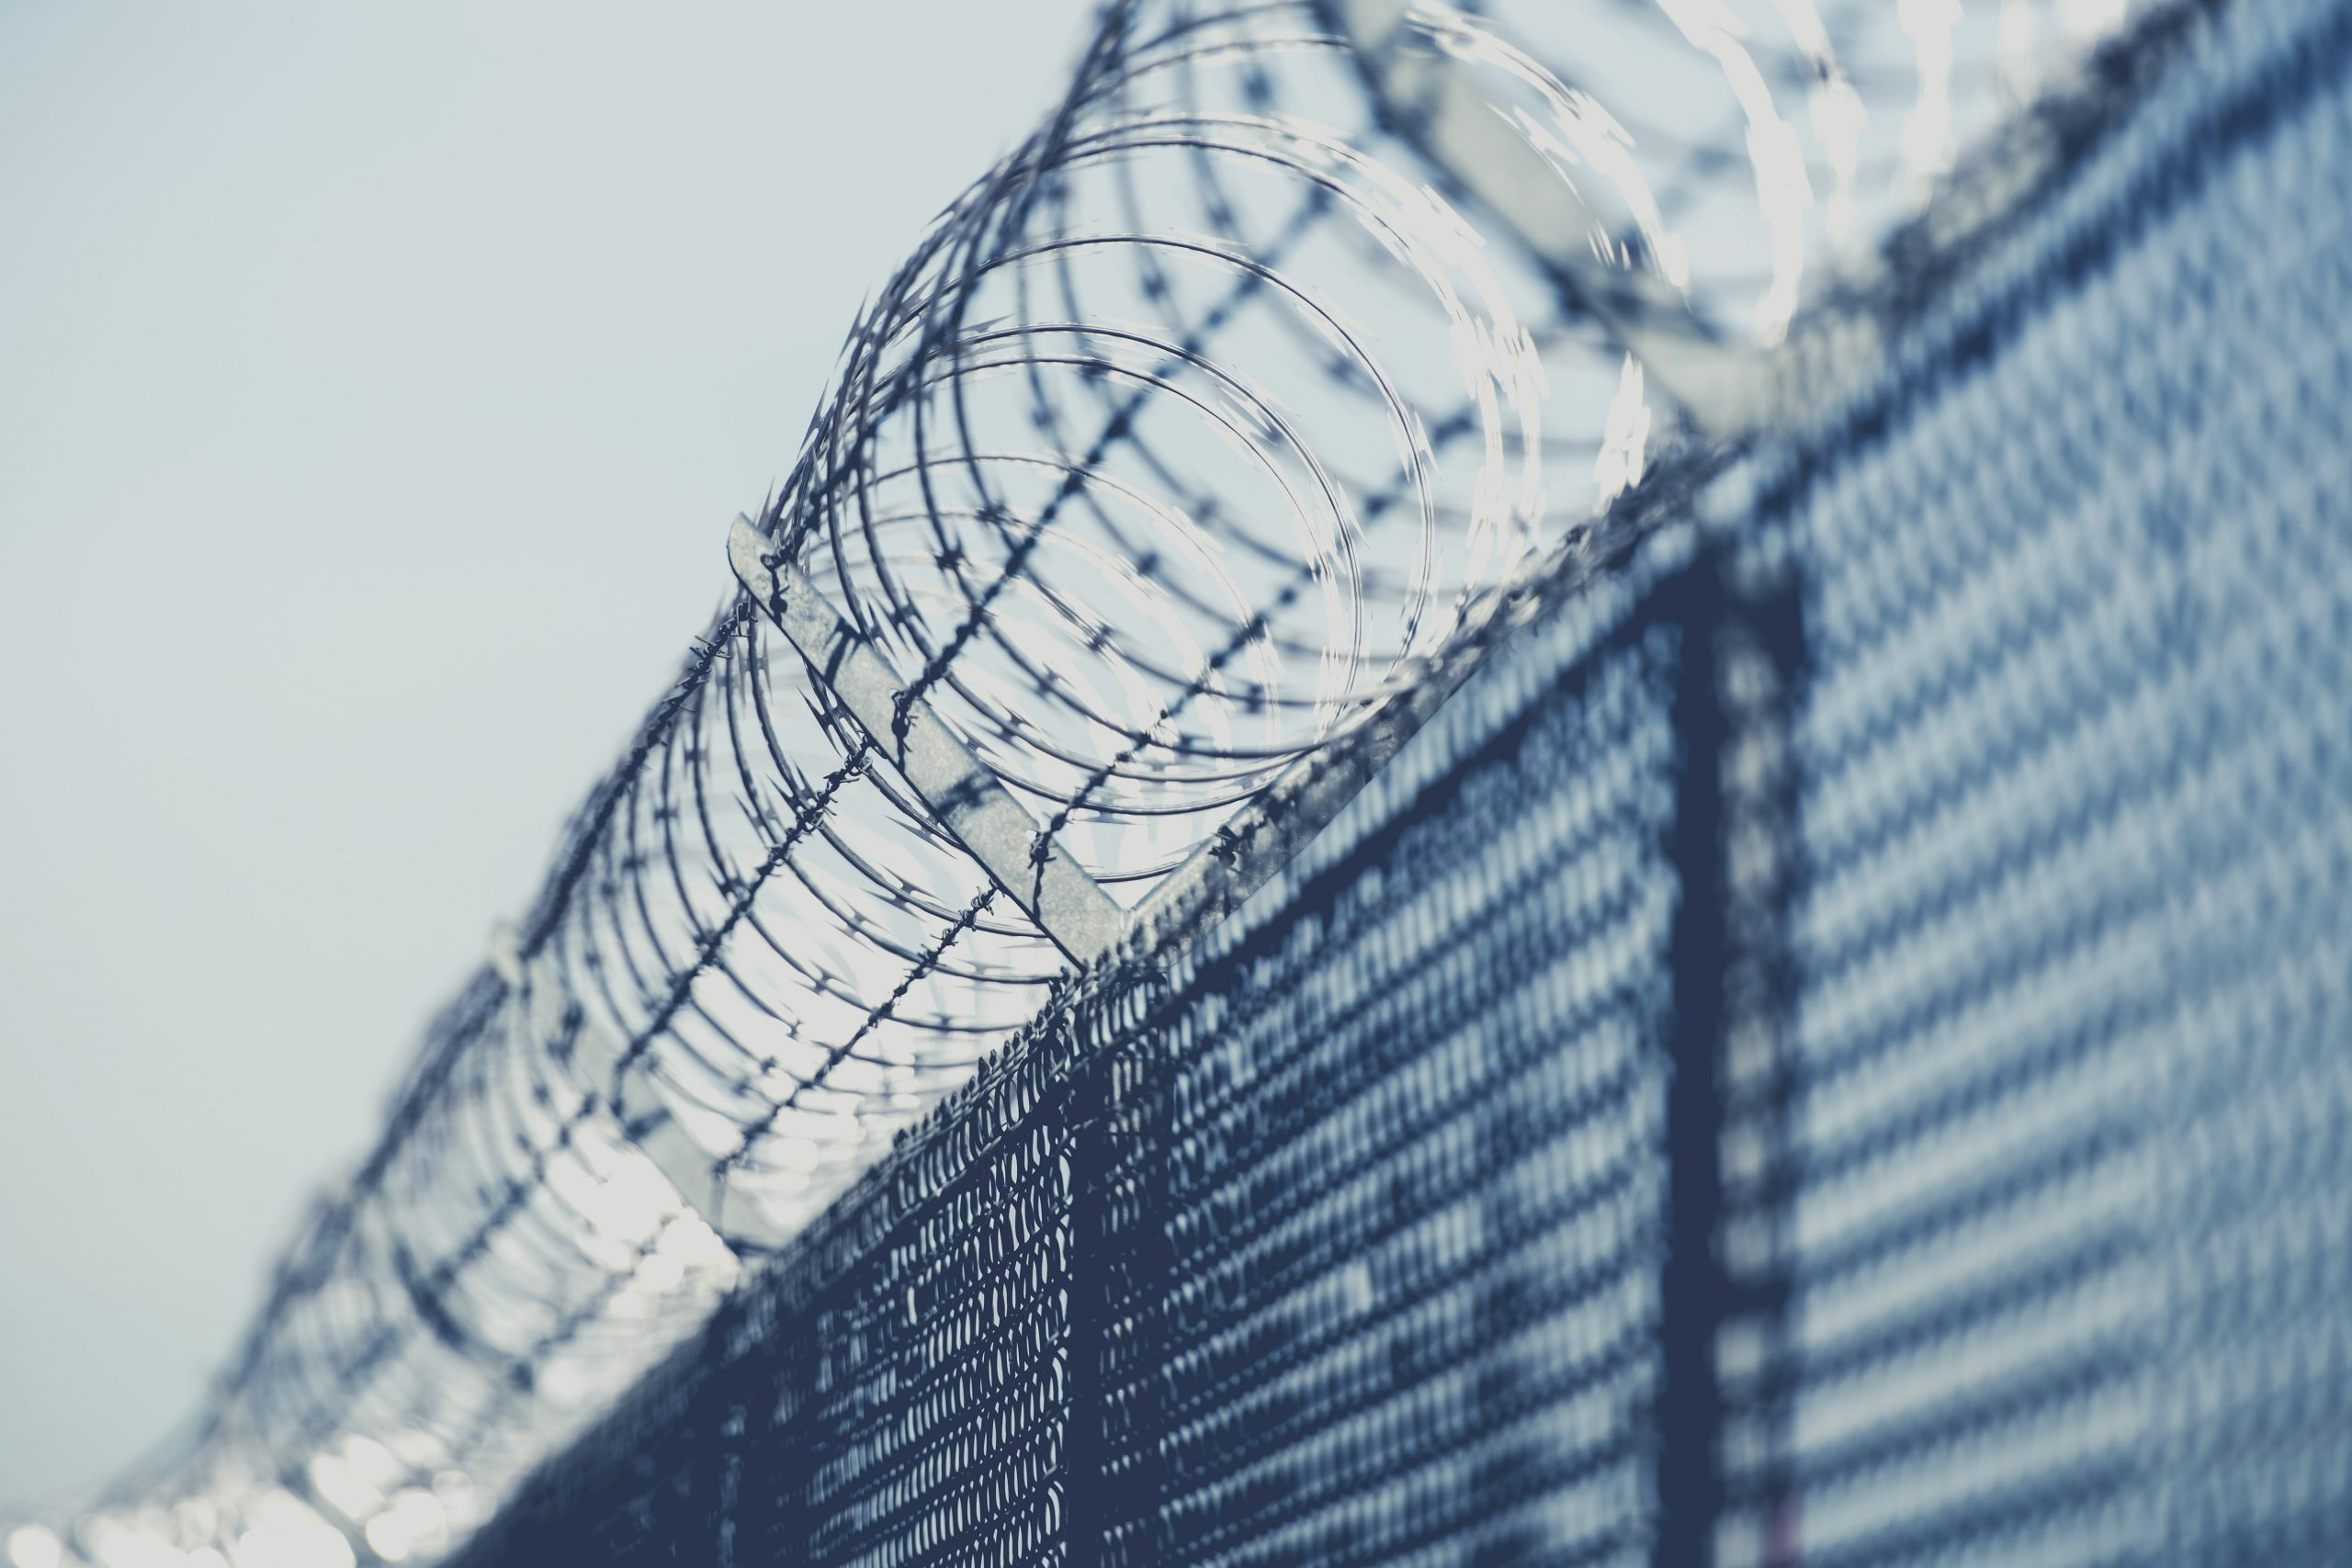 restricted-area-barbed-fence-PDBRHPZ-min